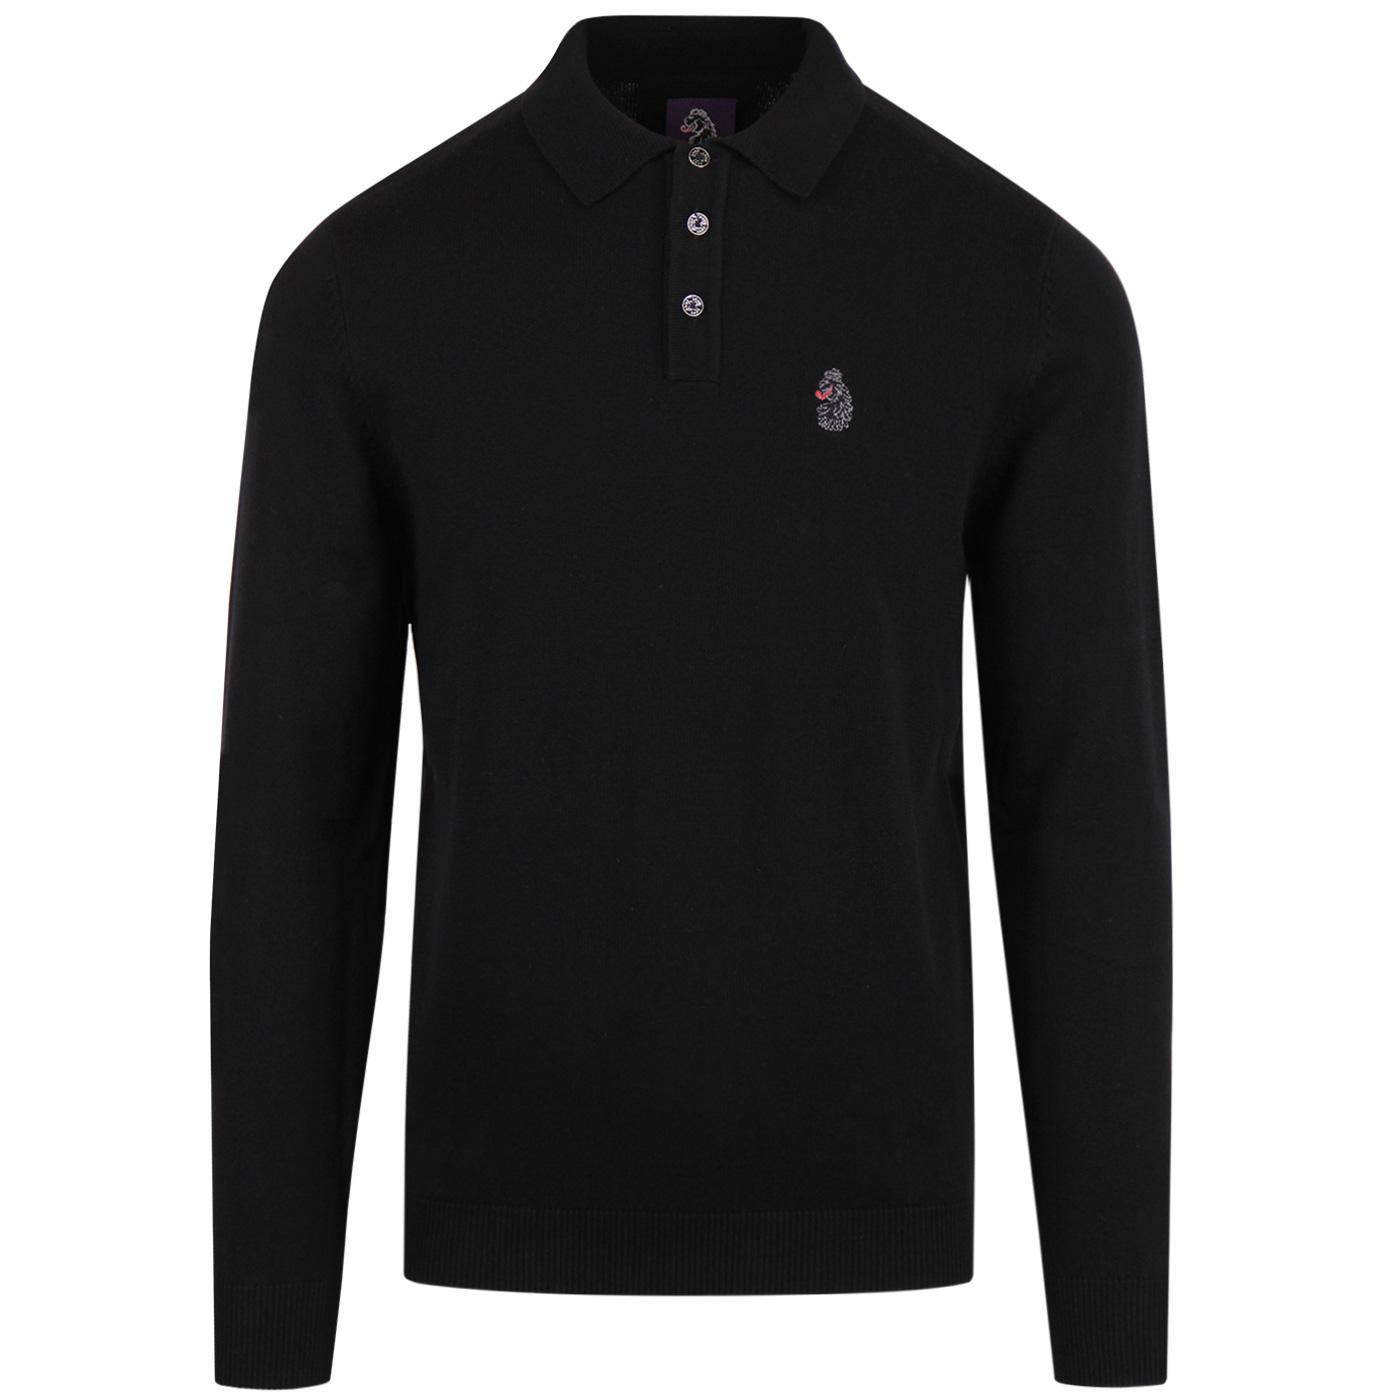 Magnesium LUKE Retro Mod Fine Knitted Polo Shirt